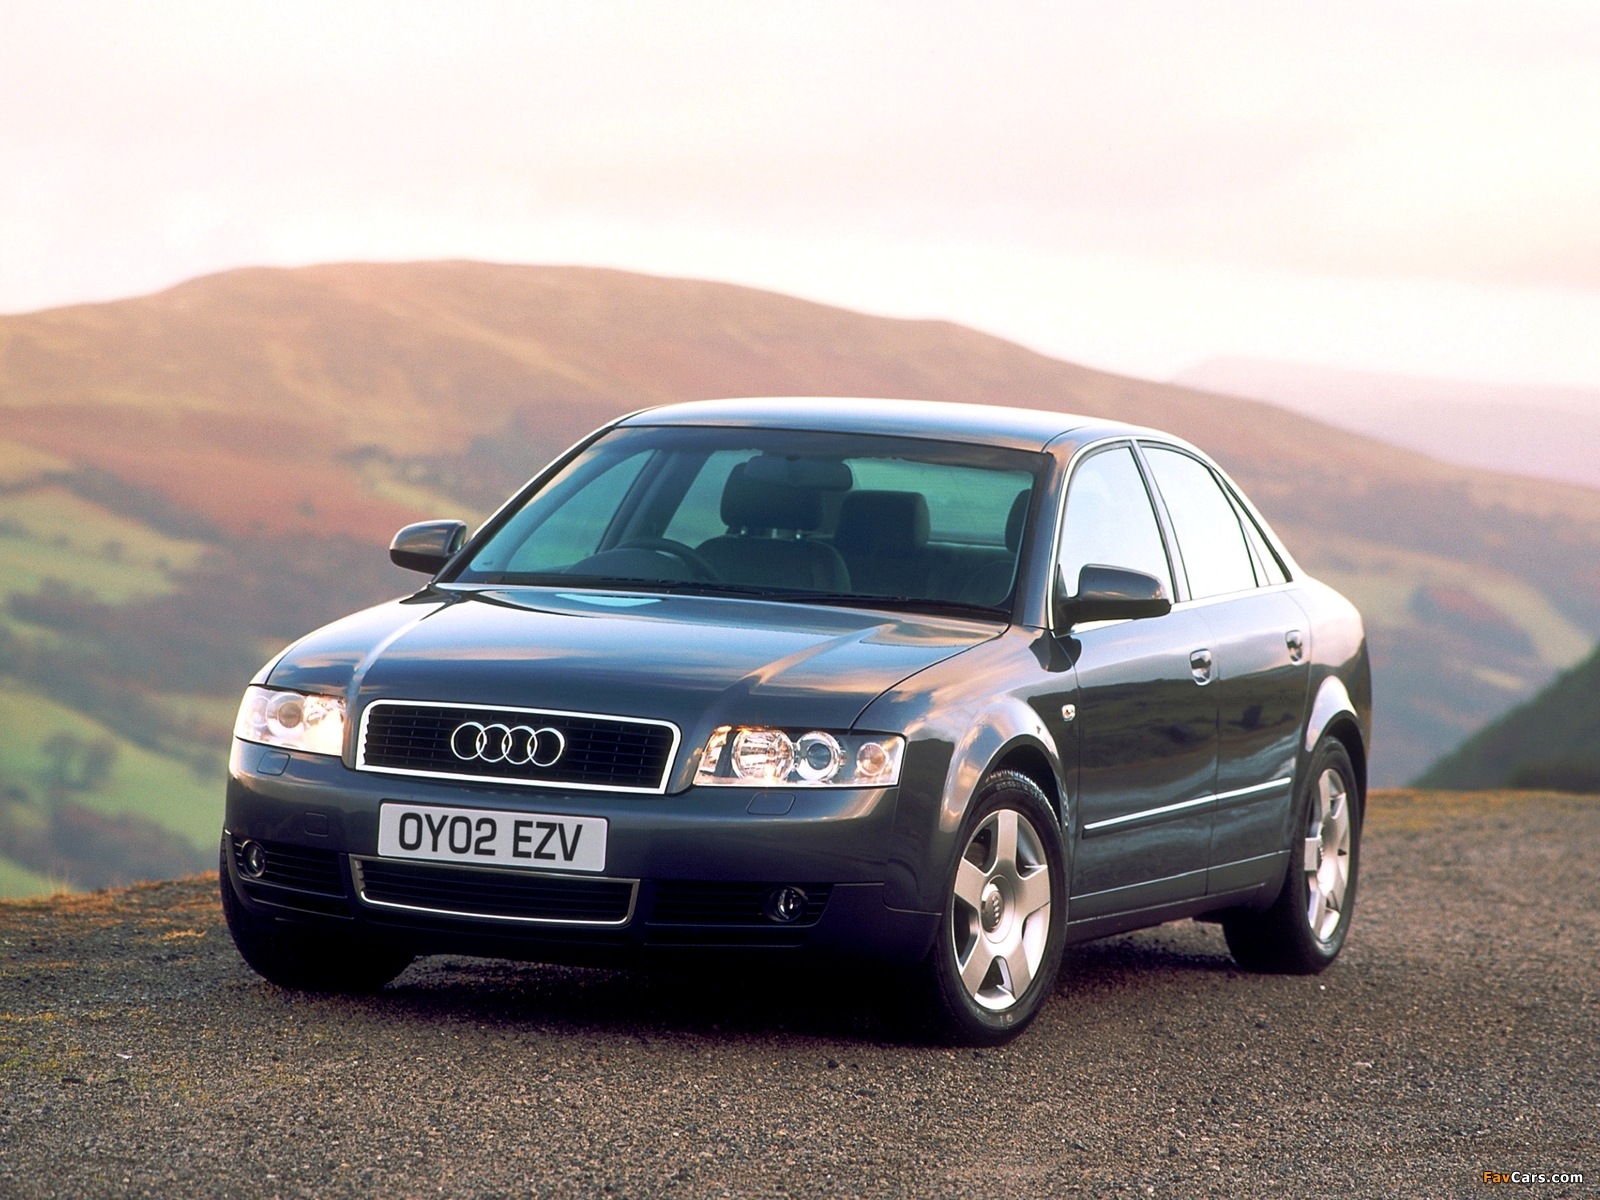 Photos of Audi A4 2.0 FSI Sedan UK-spec B6,8E (2000–2004) (1600x1200)